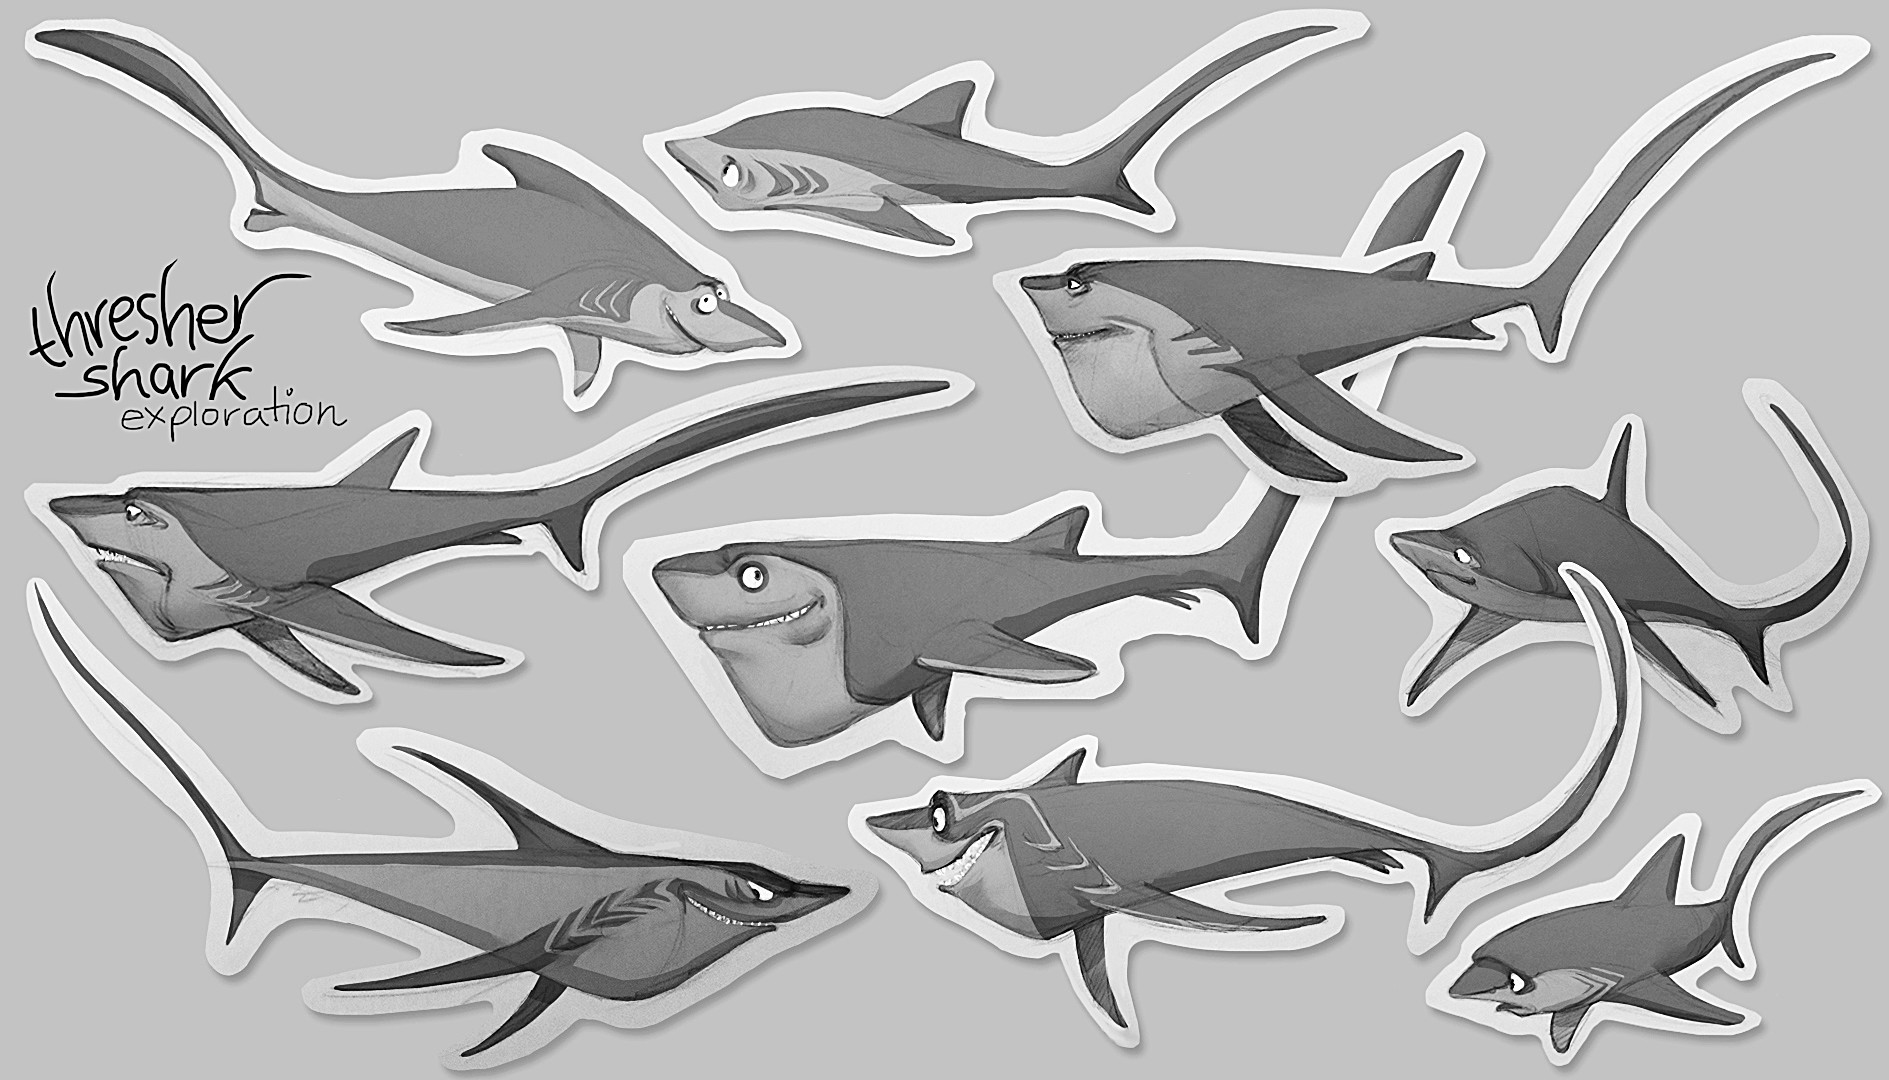 Vivien lulkowski thresher shark